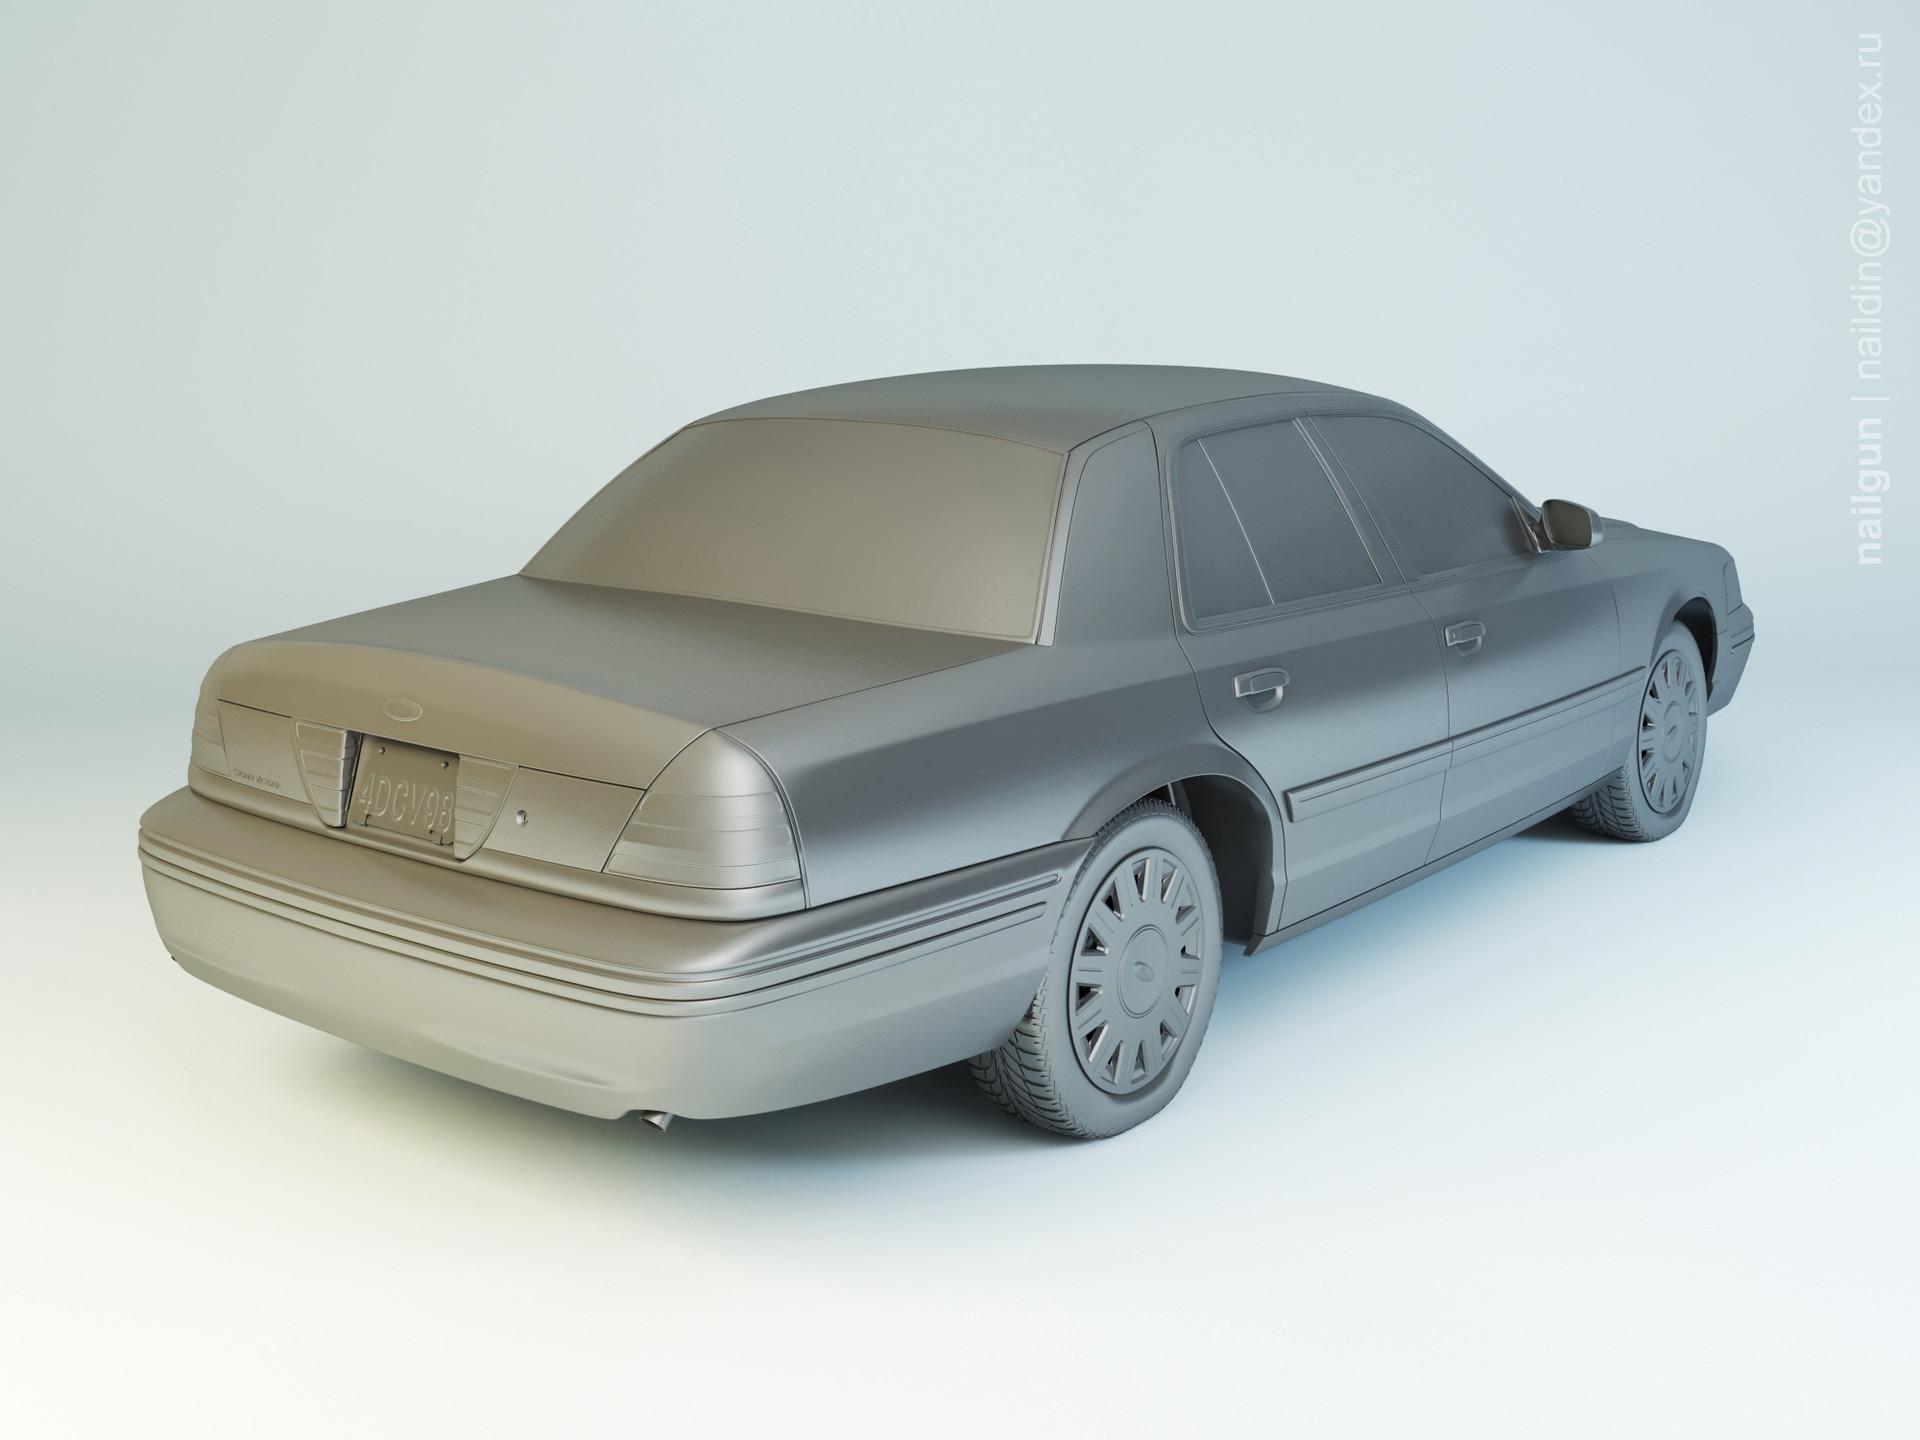 Nail khusnutdinov pwc 036 000 ford cv modelling 1